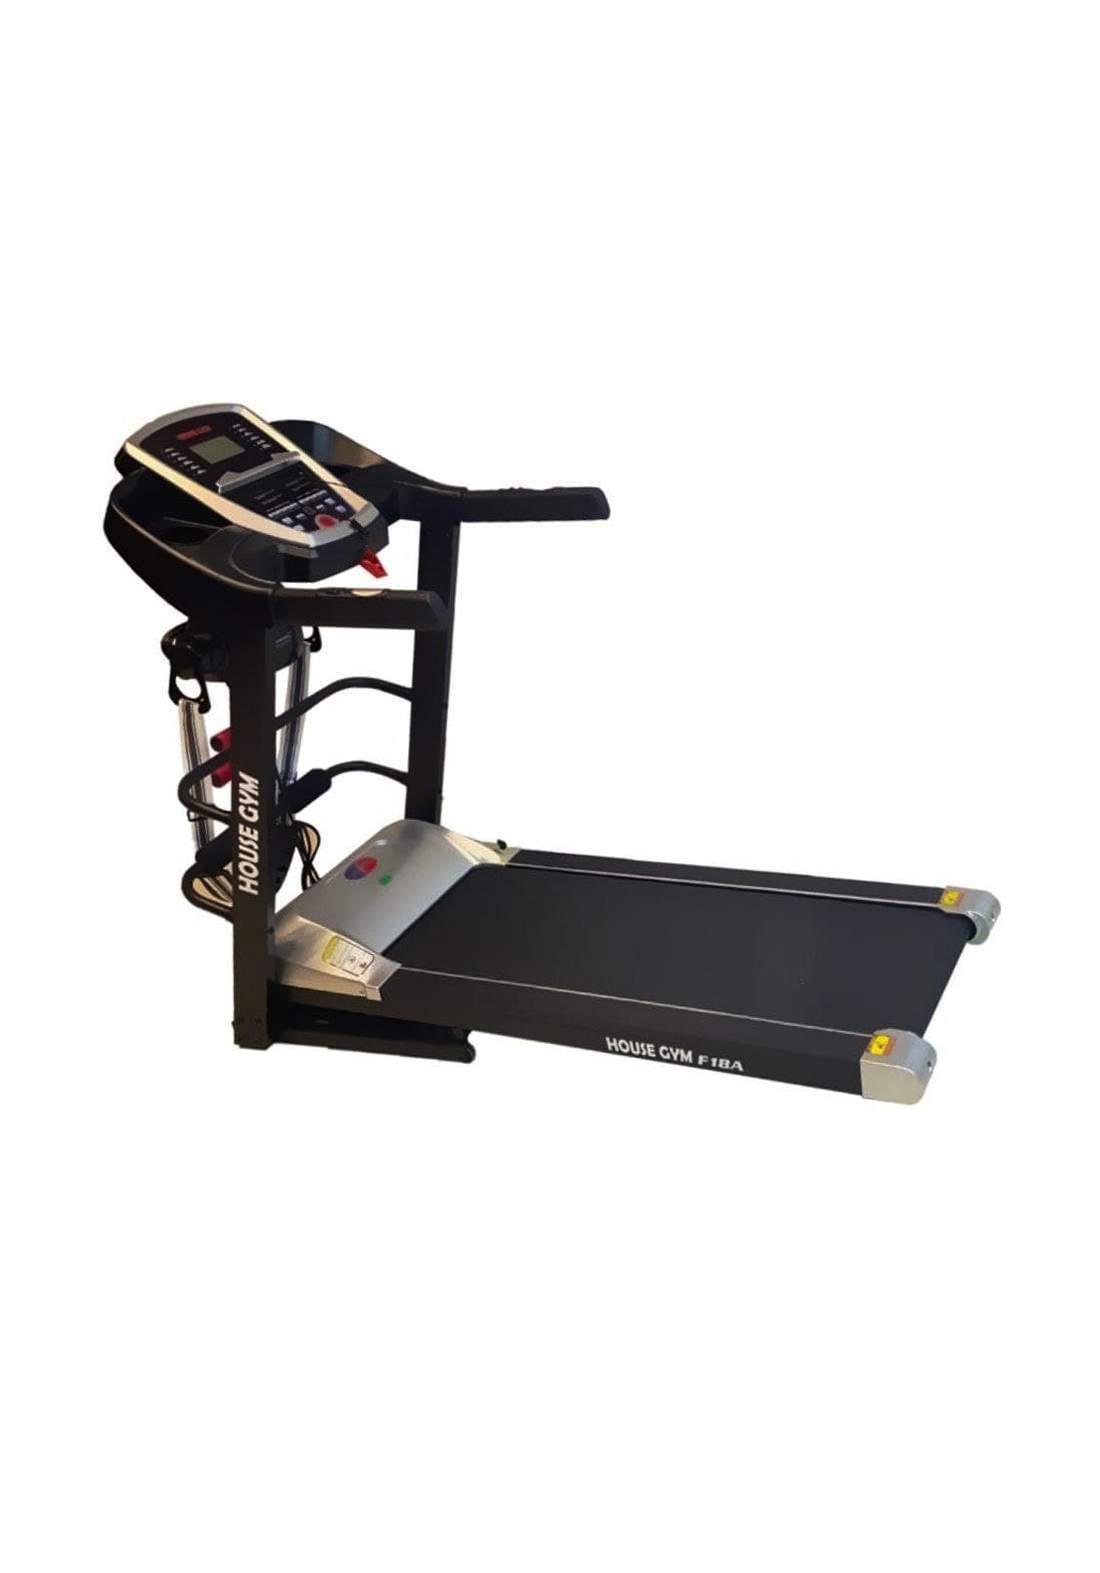 House Gym Electric Treadmill جهاز الجري الكهربائي